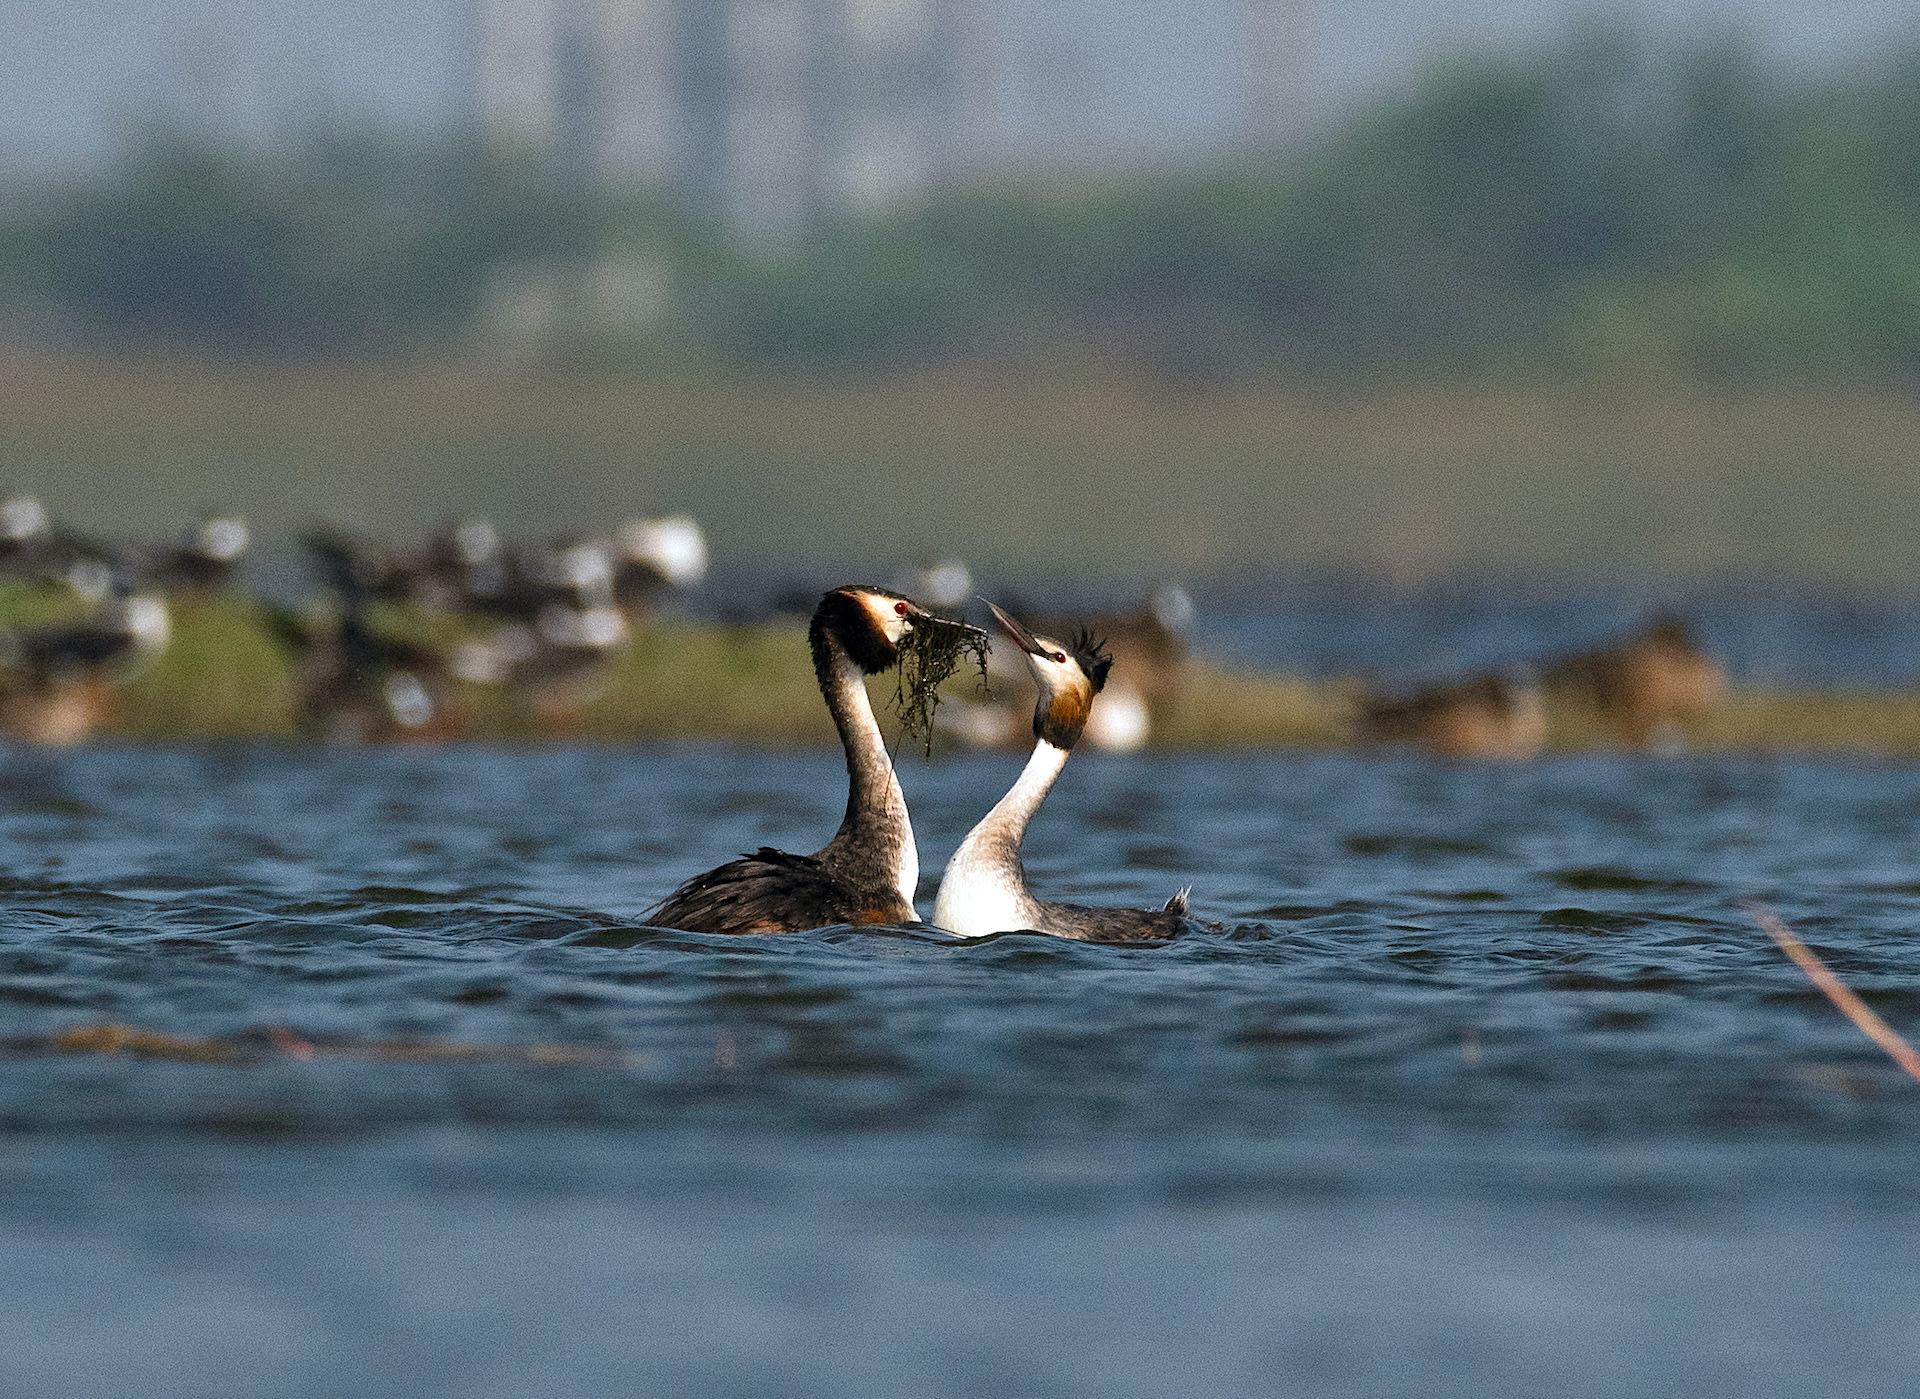 gujarat-jamnagar-great-crested-grebe-courtship-dance-close